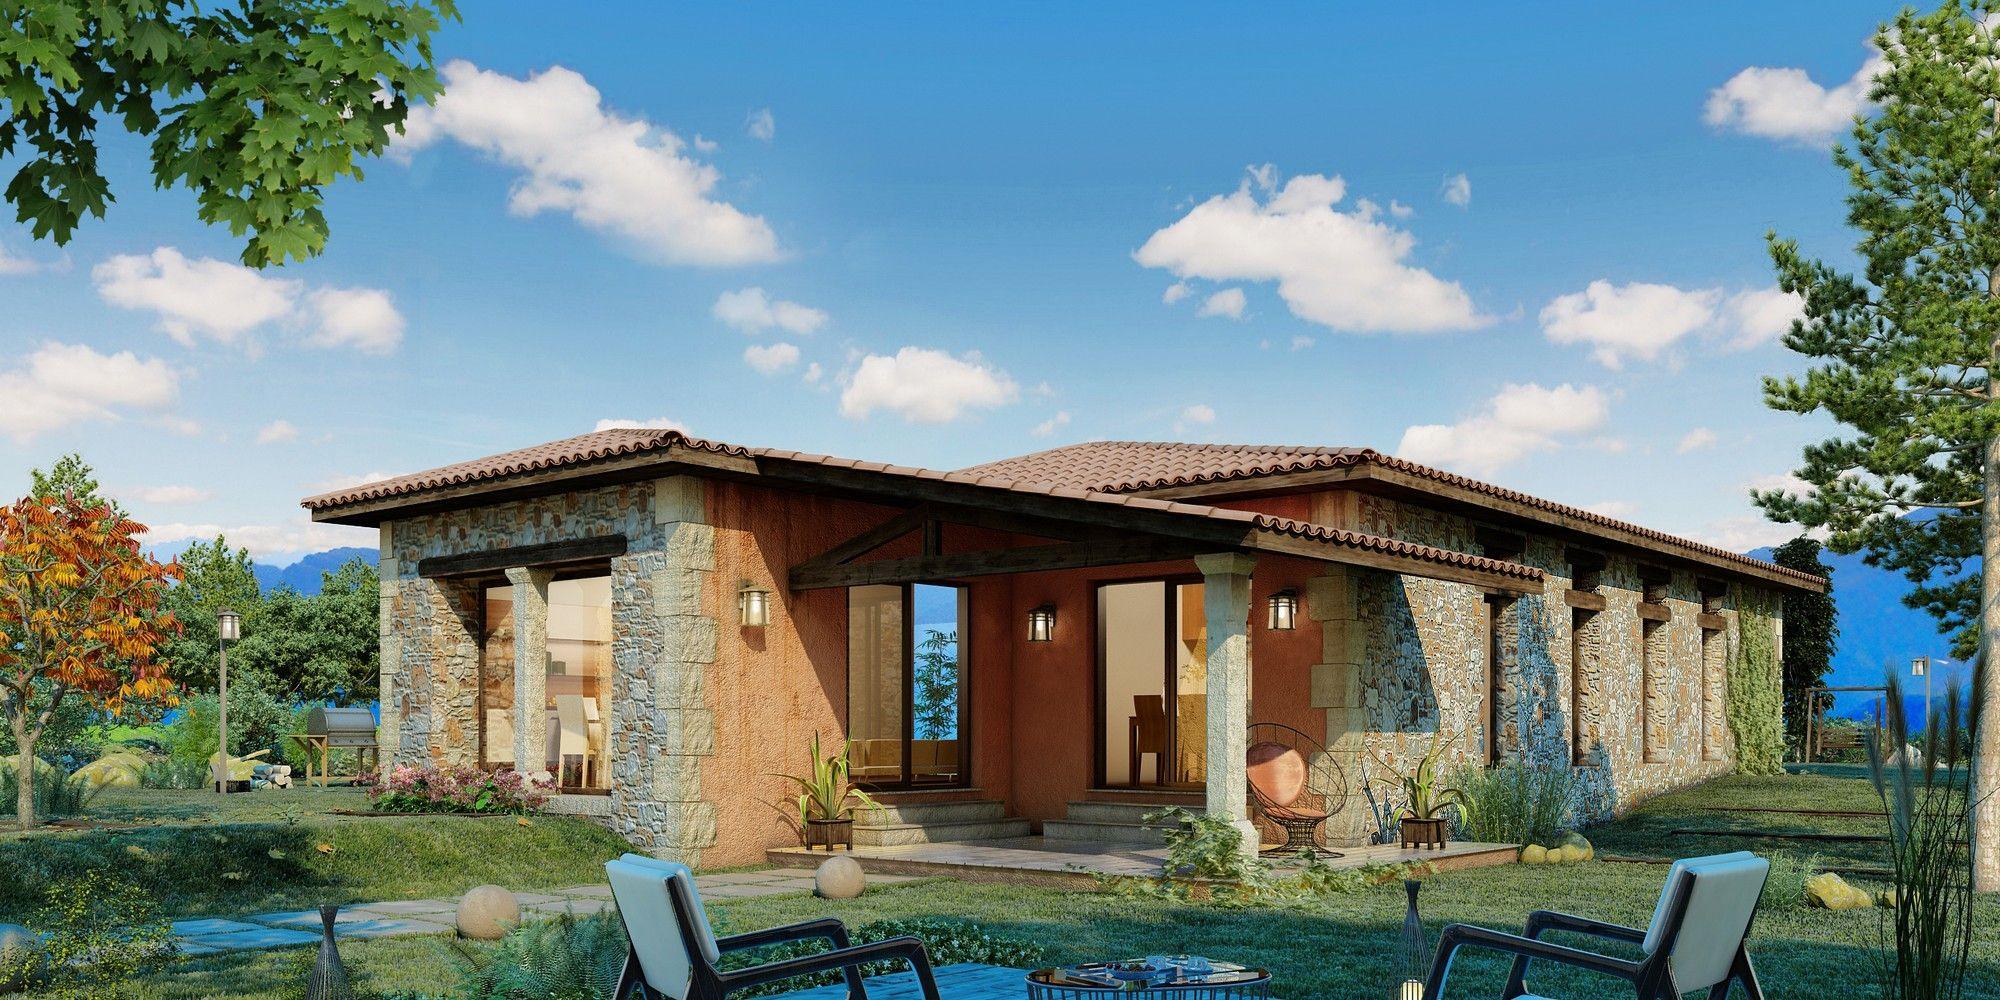 Casas rusticas modernas pesquisa google reforma for Fachadas de casas estilo rustico moderno